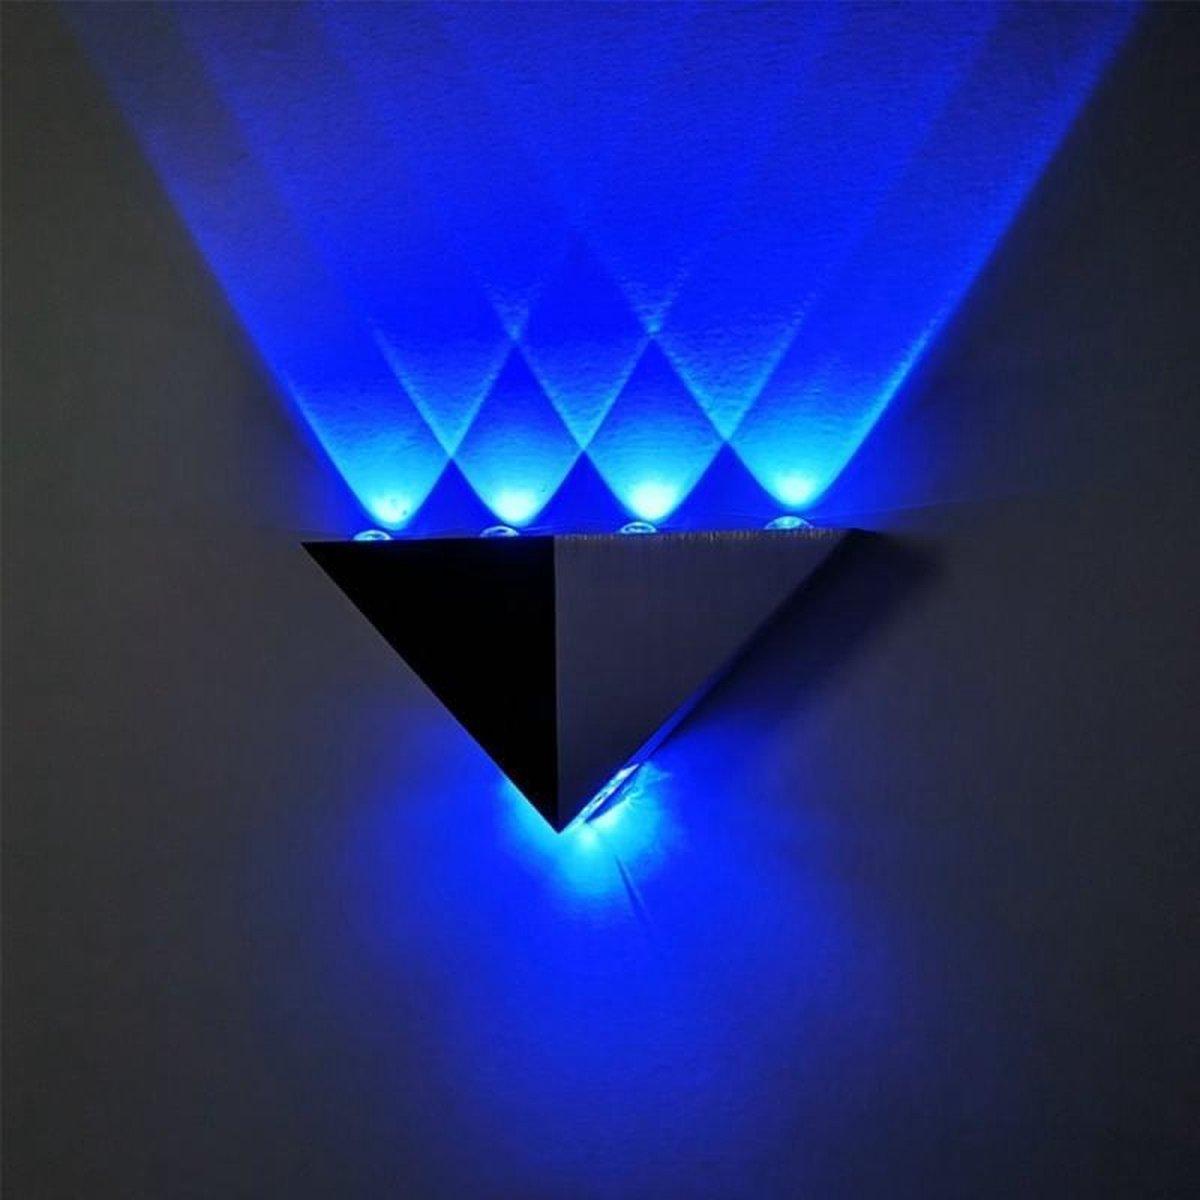 Bol Com Ywxlight 5w Driehoek Creatieve Led Muur Lamp Corridor Gangpad Lichten Bar Slaapkamer